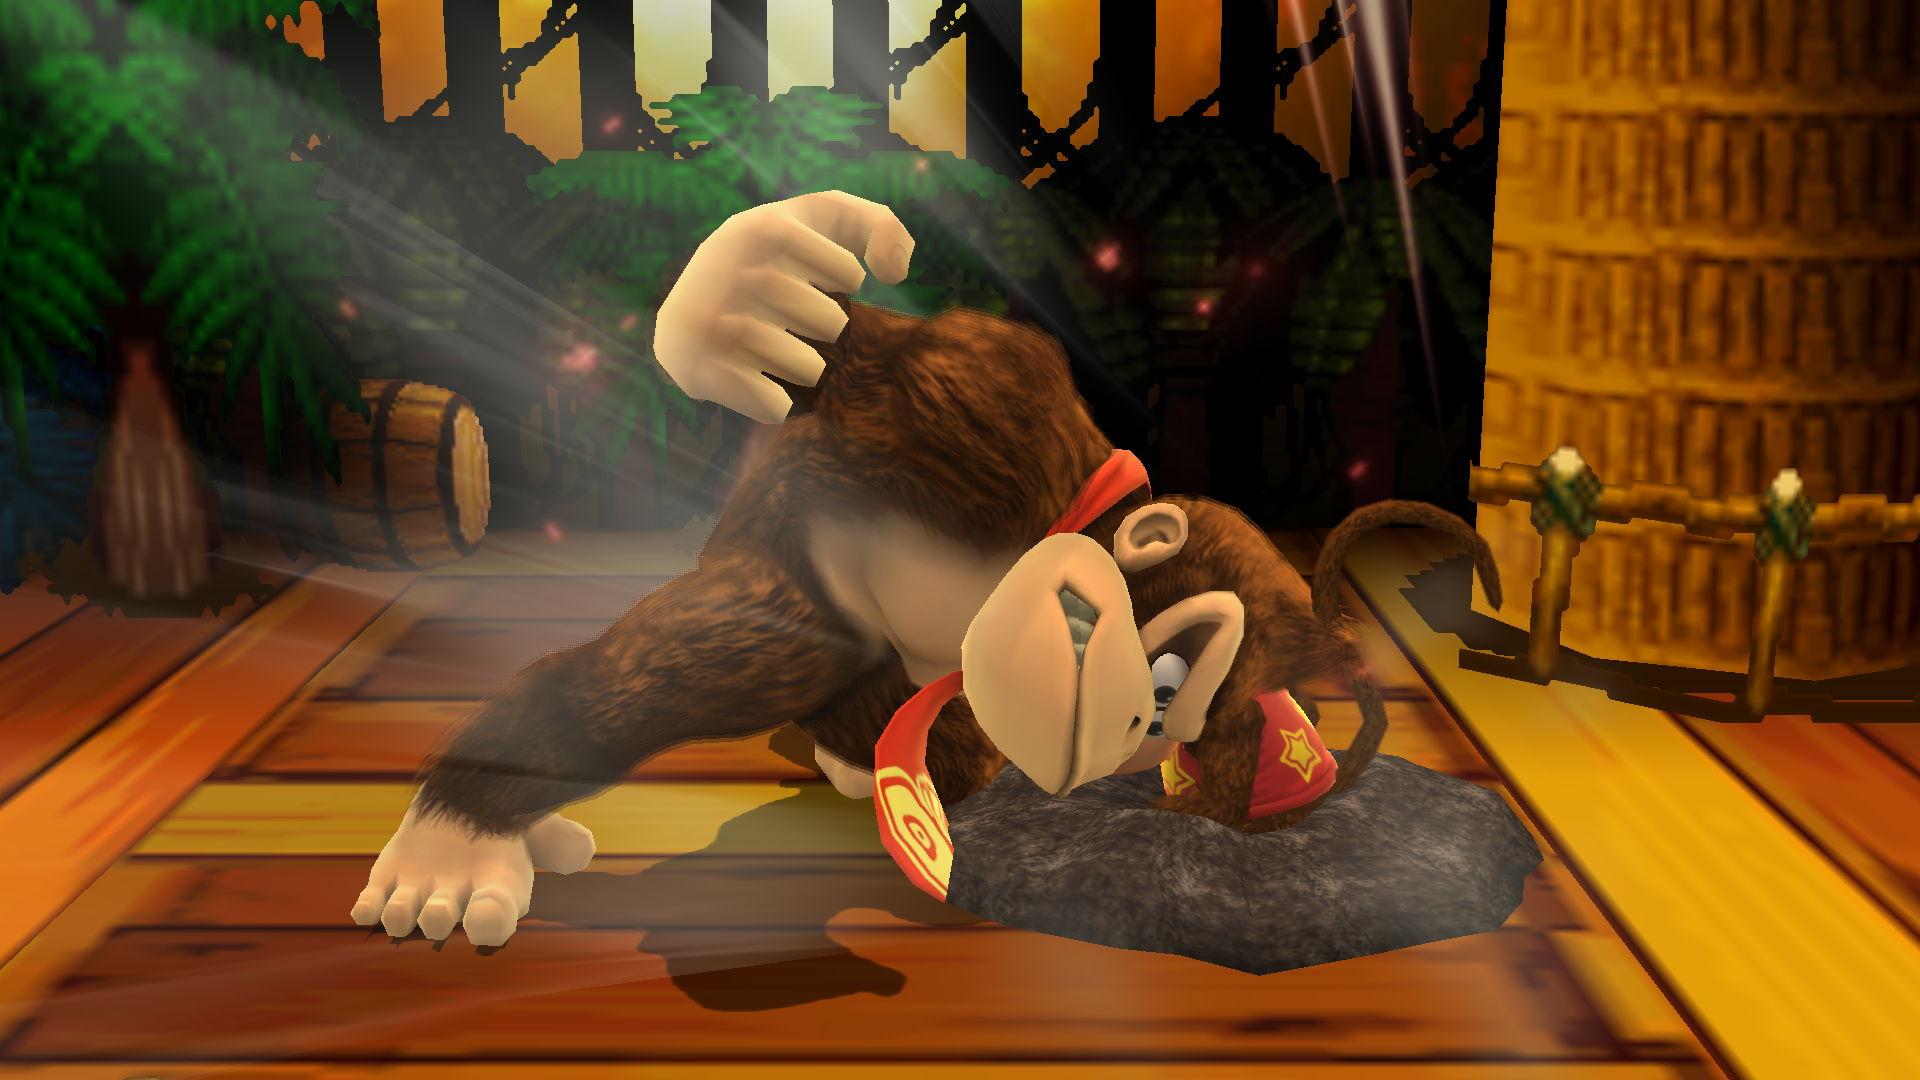 Donkey Kong in smash